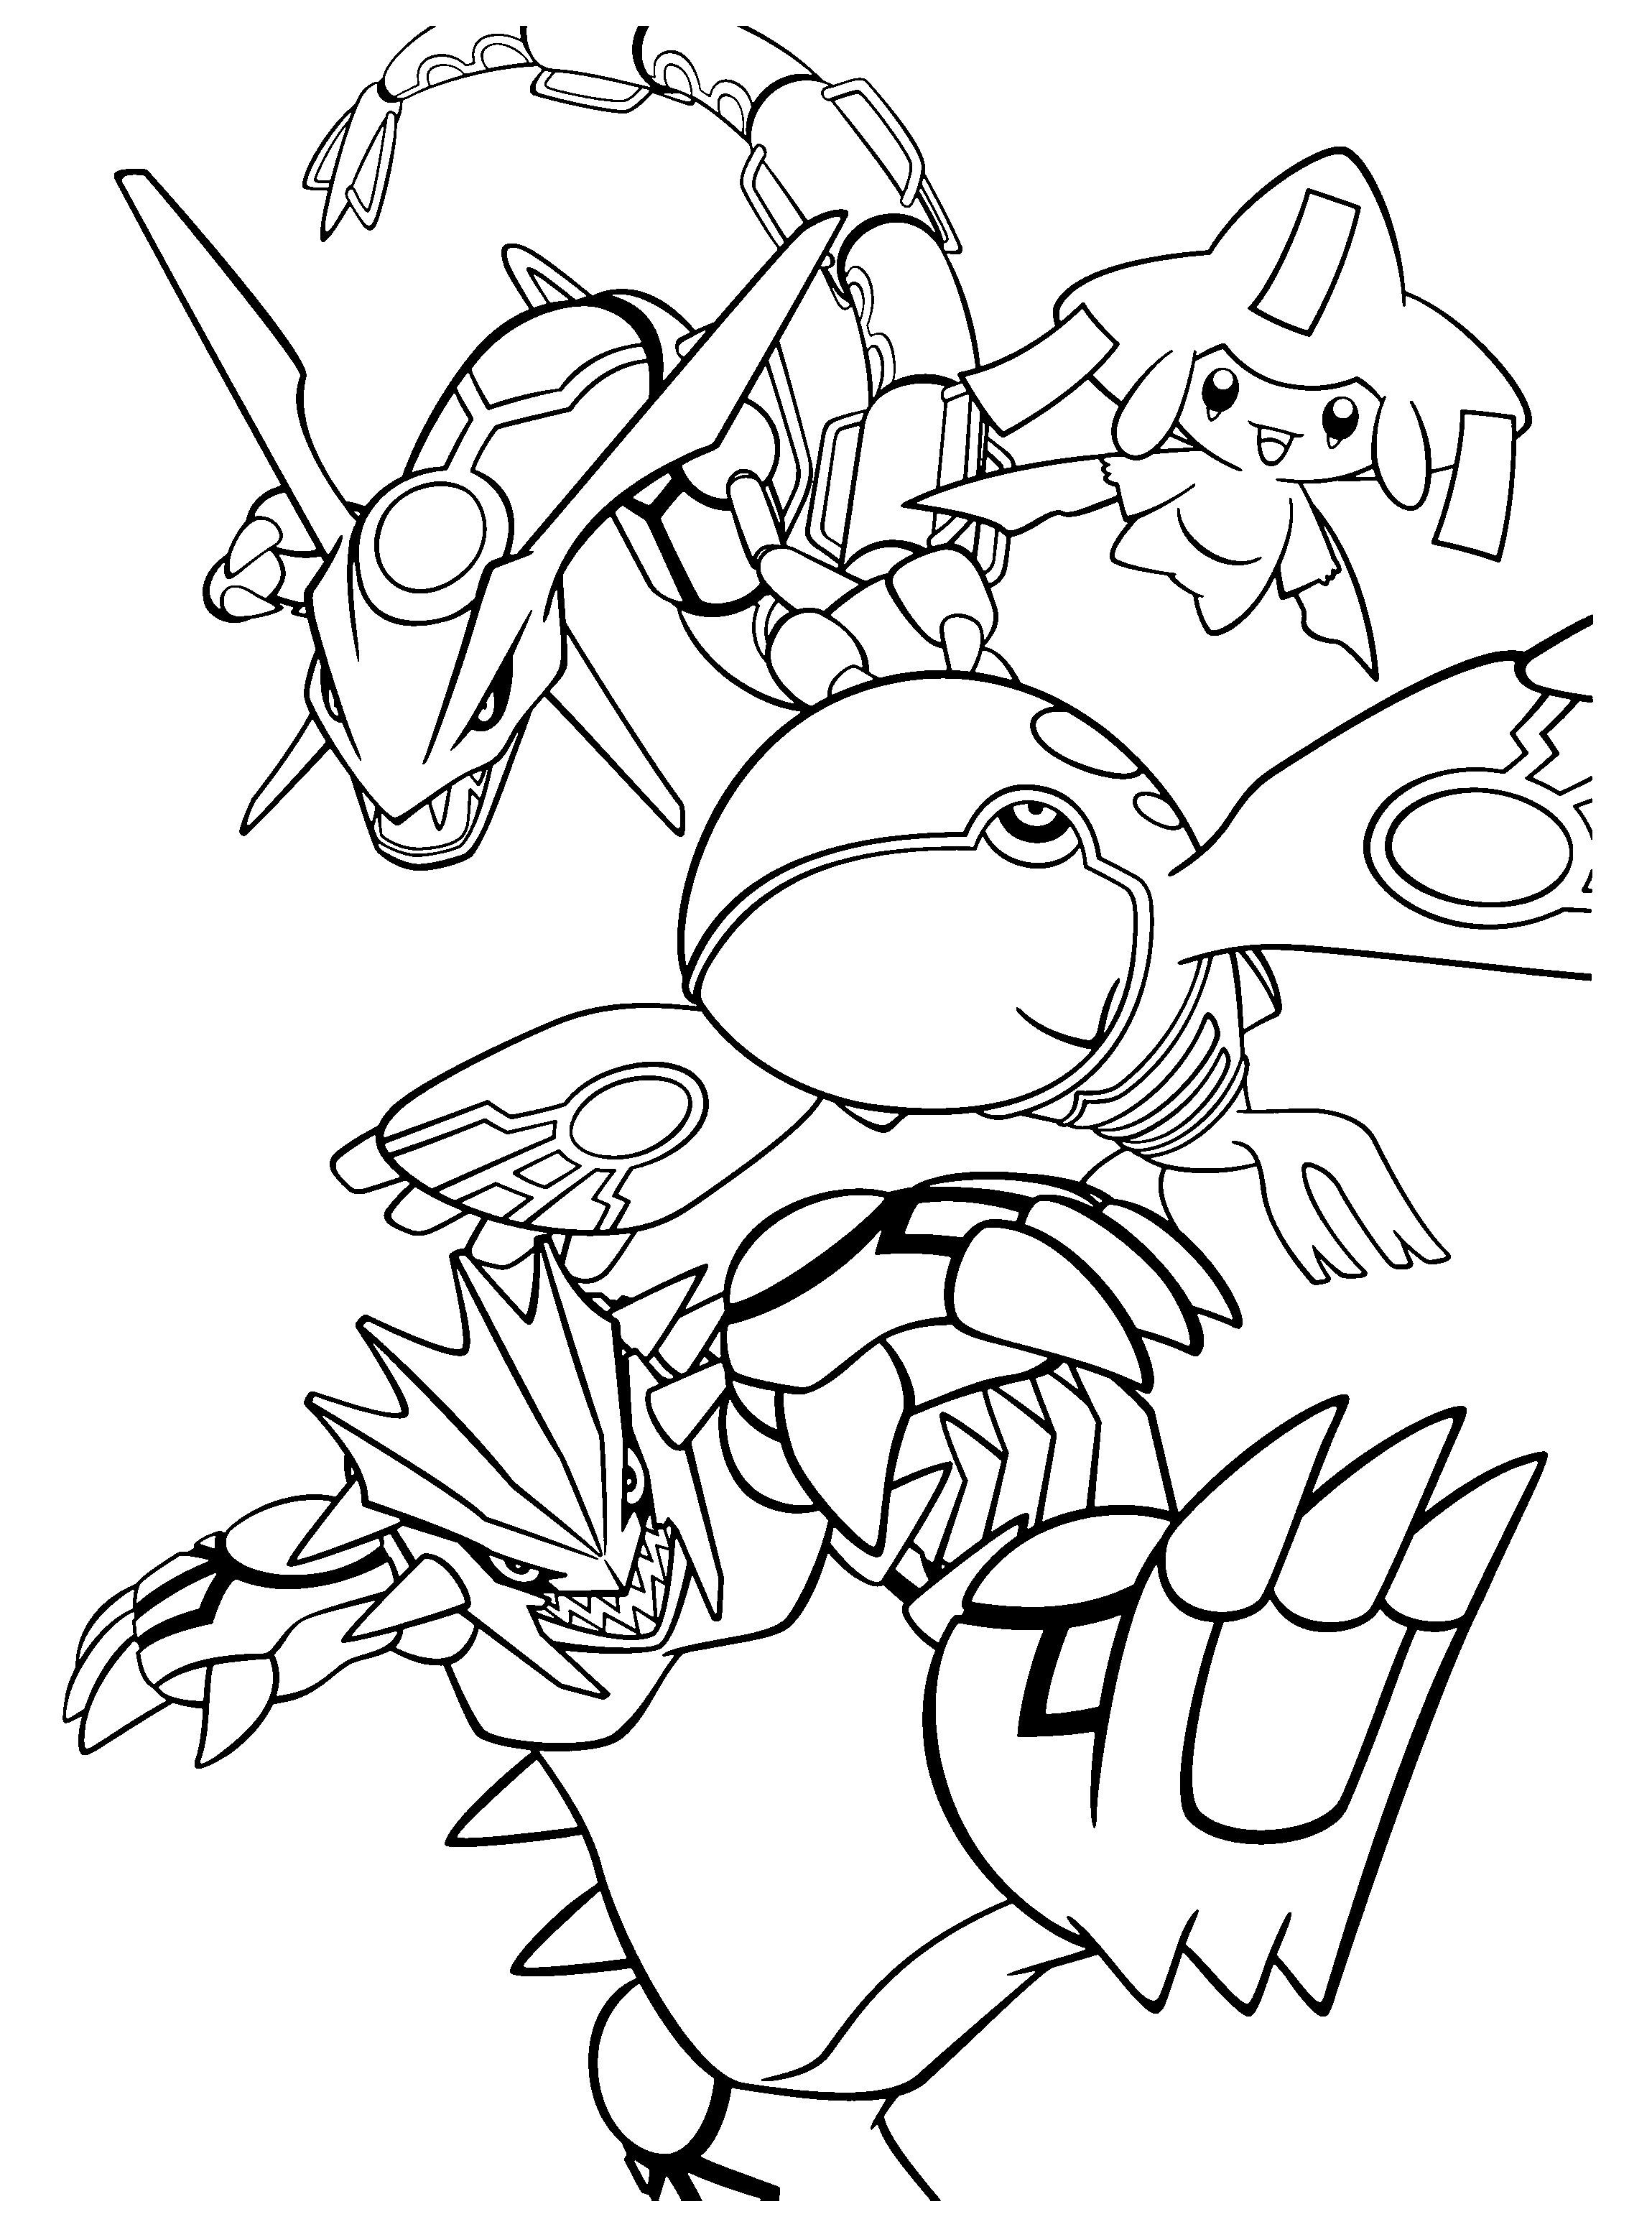 Ausmalbilder Pokemon Gx Neu Bol Das Bild